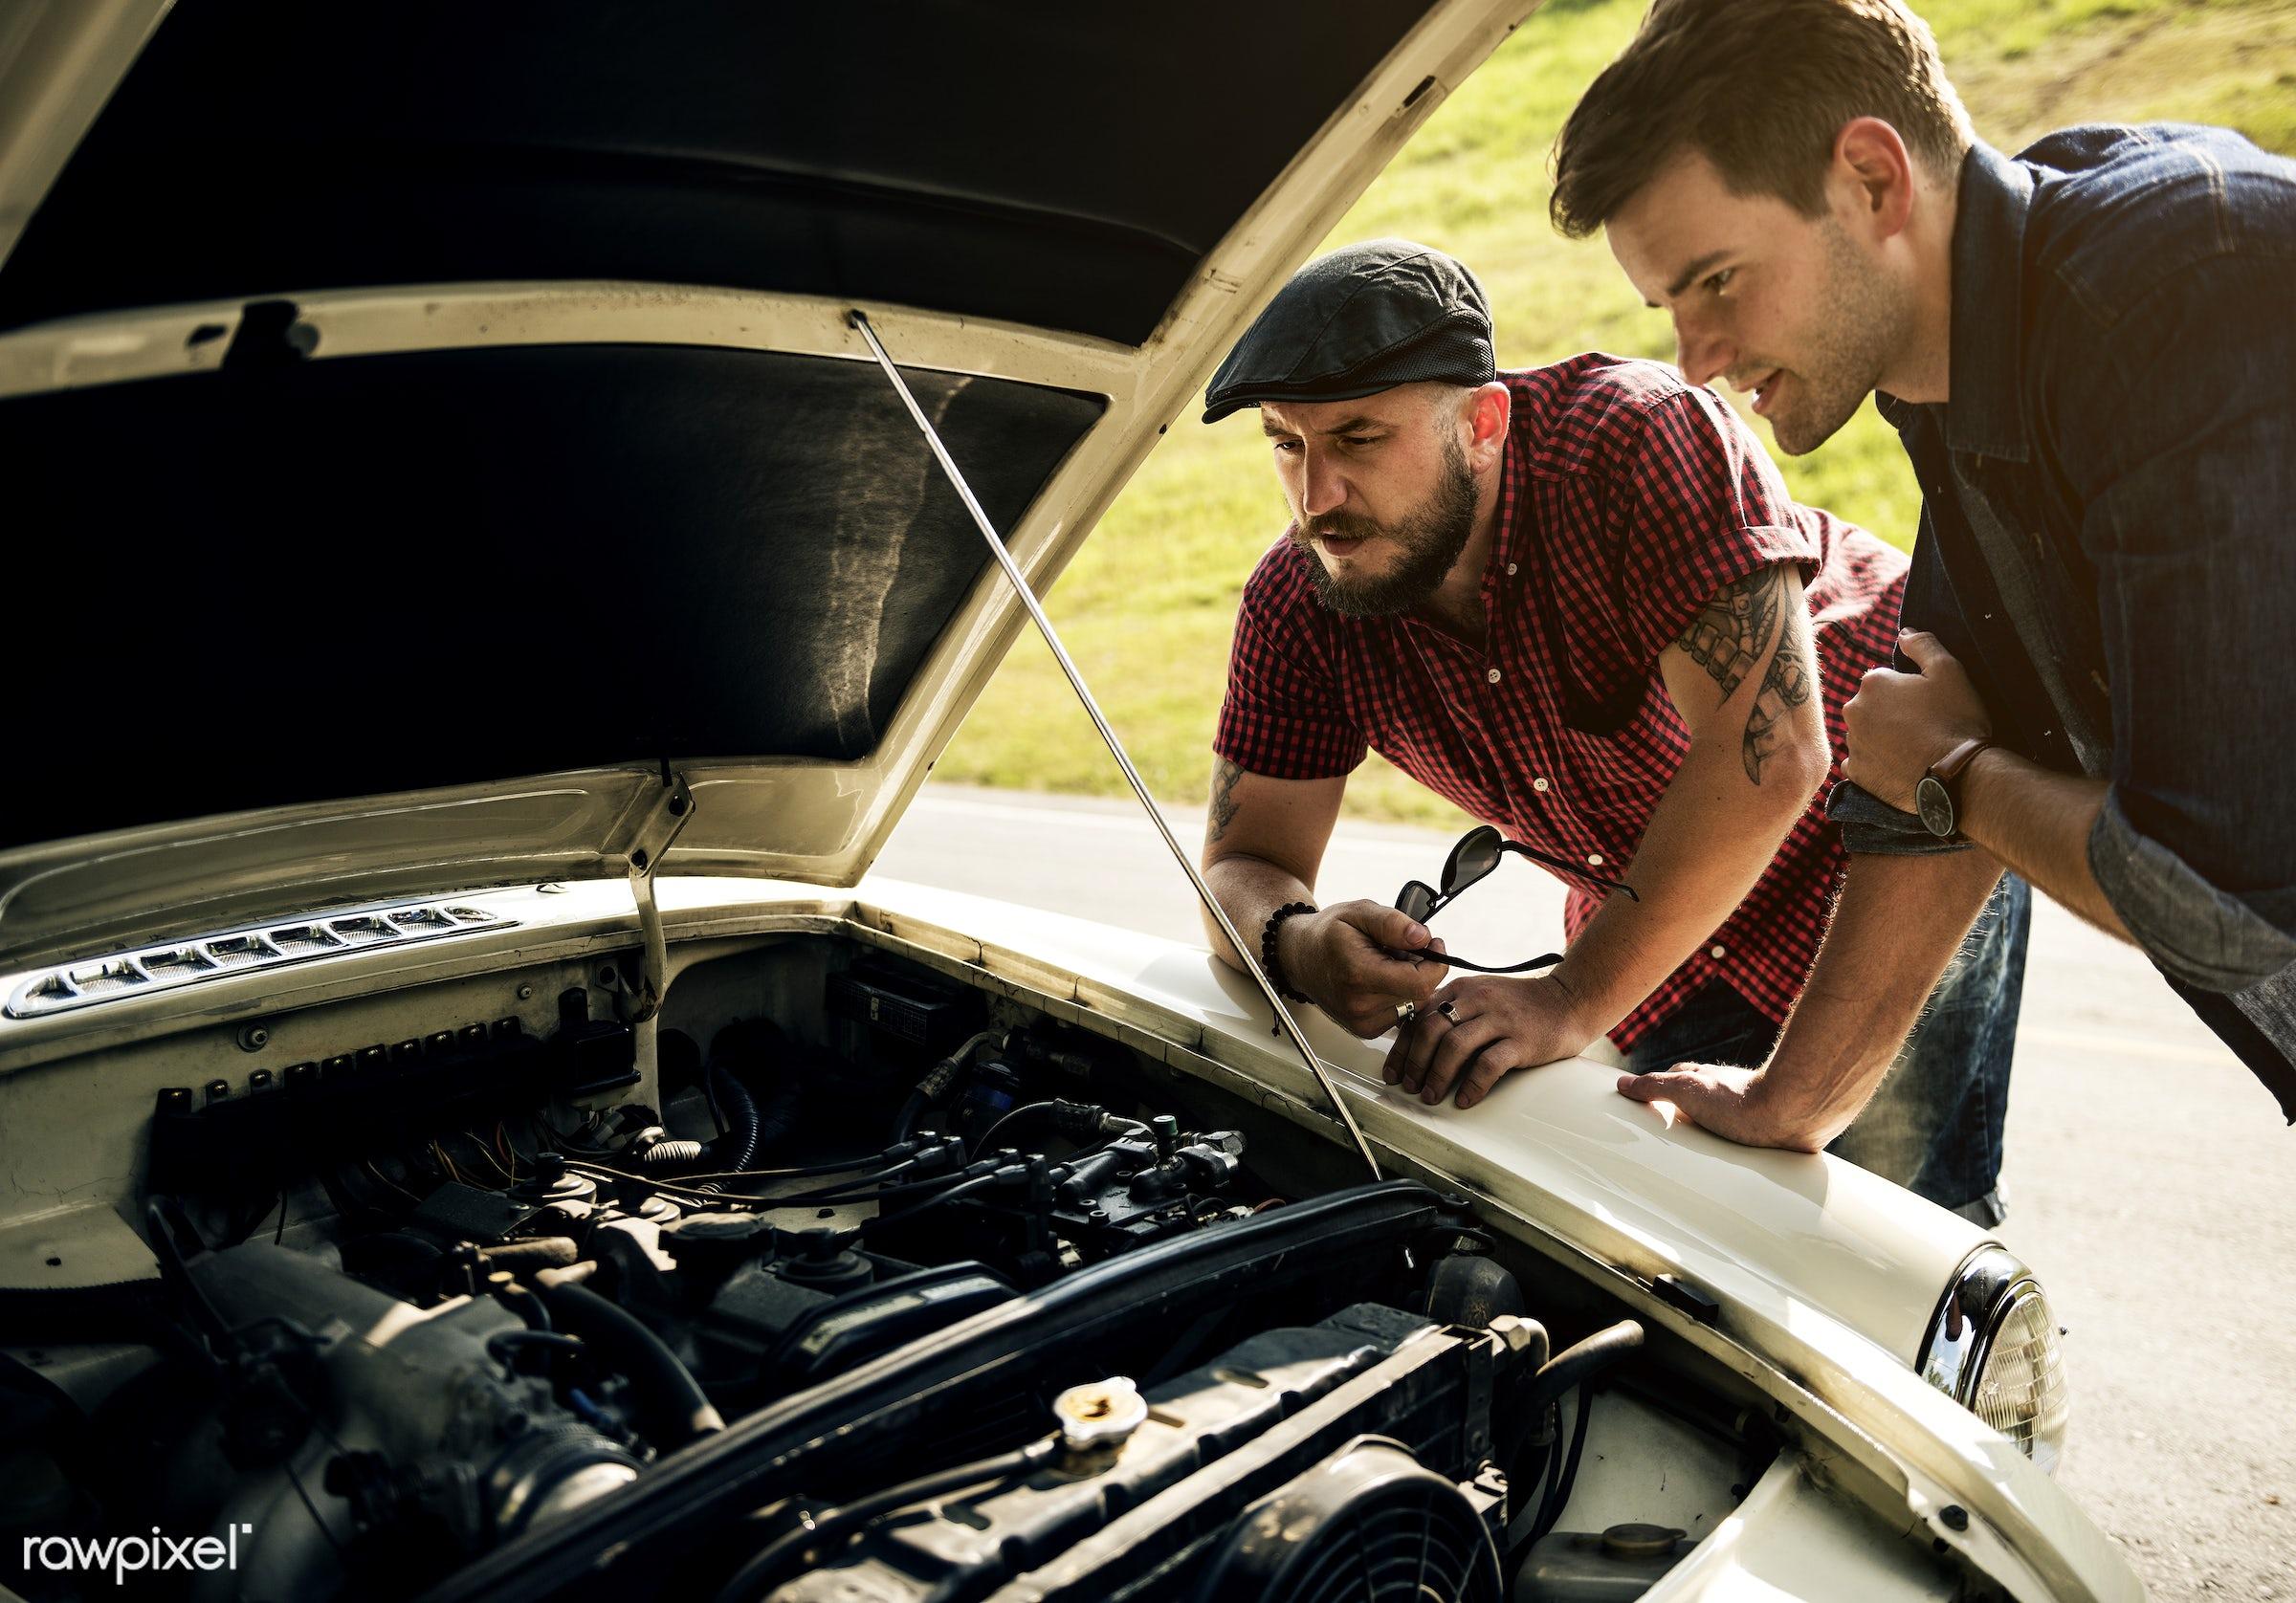 car, automobile, vehicle, street, travel, road, heat, trouble, help, transport, motor, driver, repair, men, hood, man,...